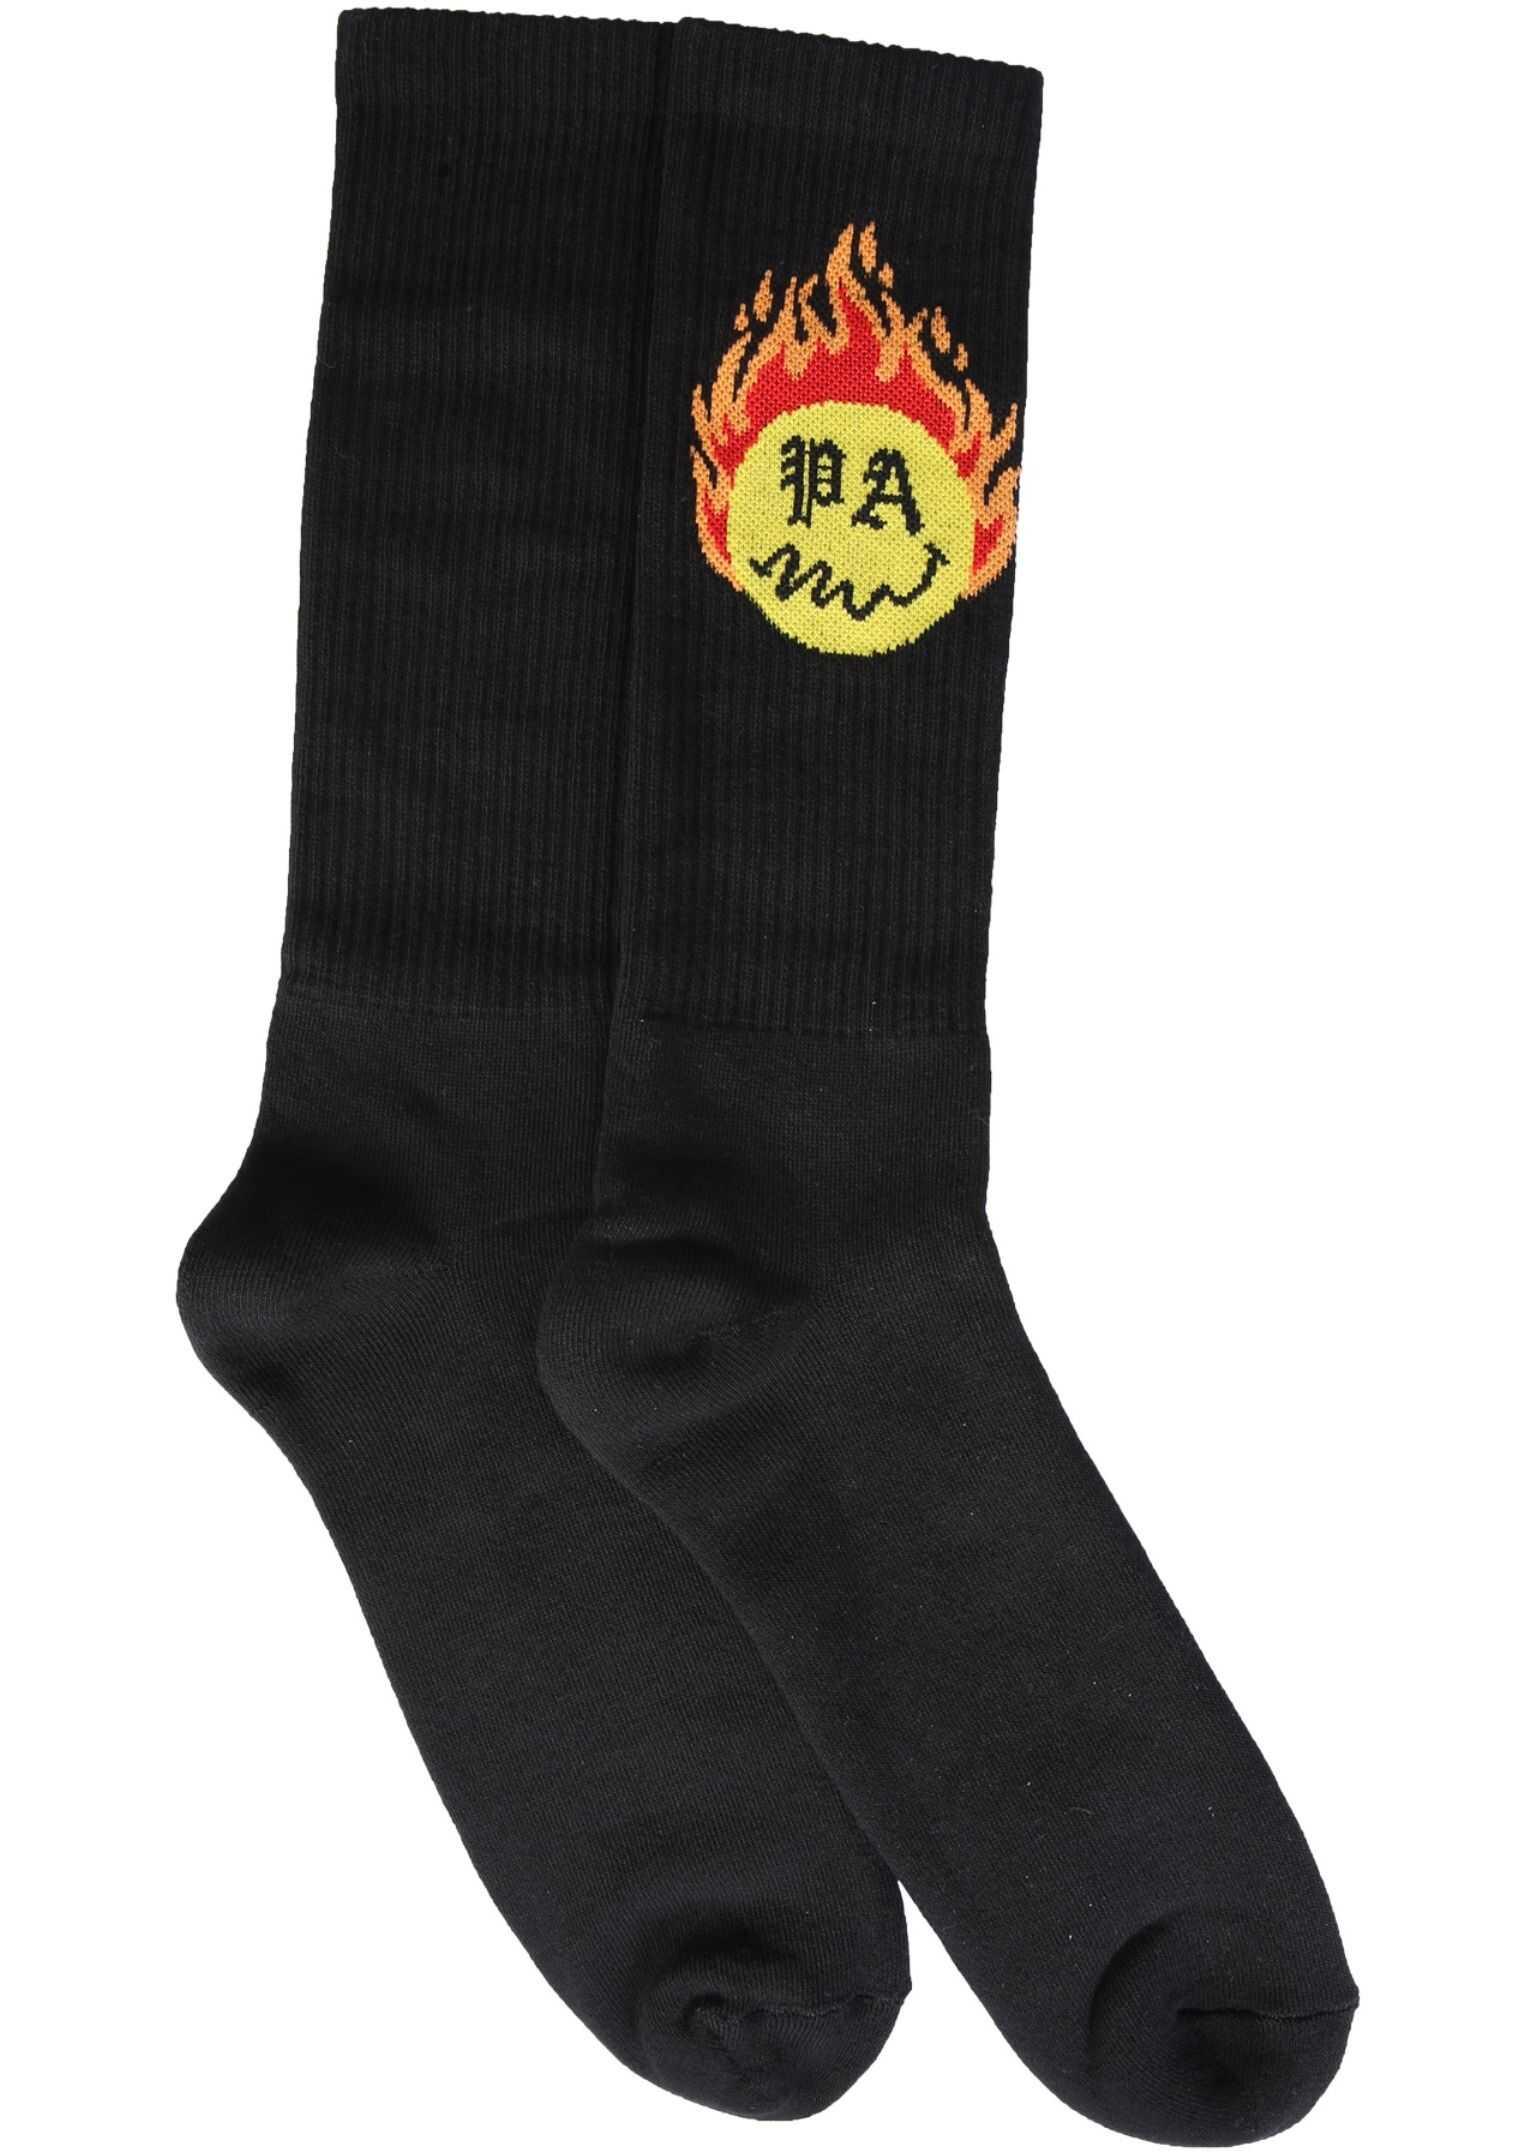 Palm Angels Socks With Burning Head Print BLACK imagine